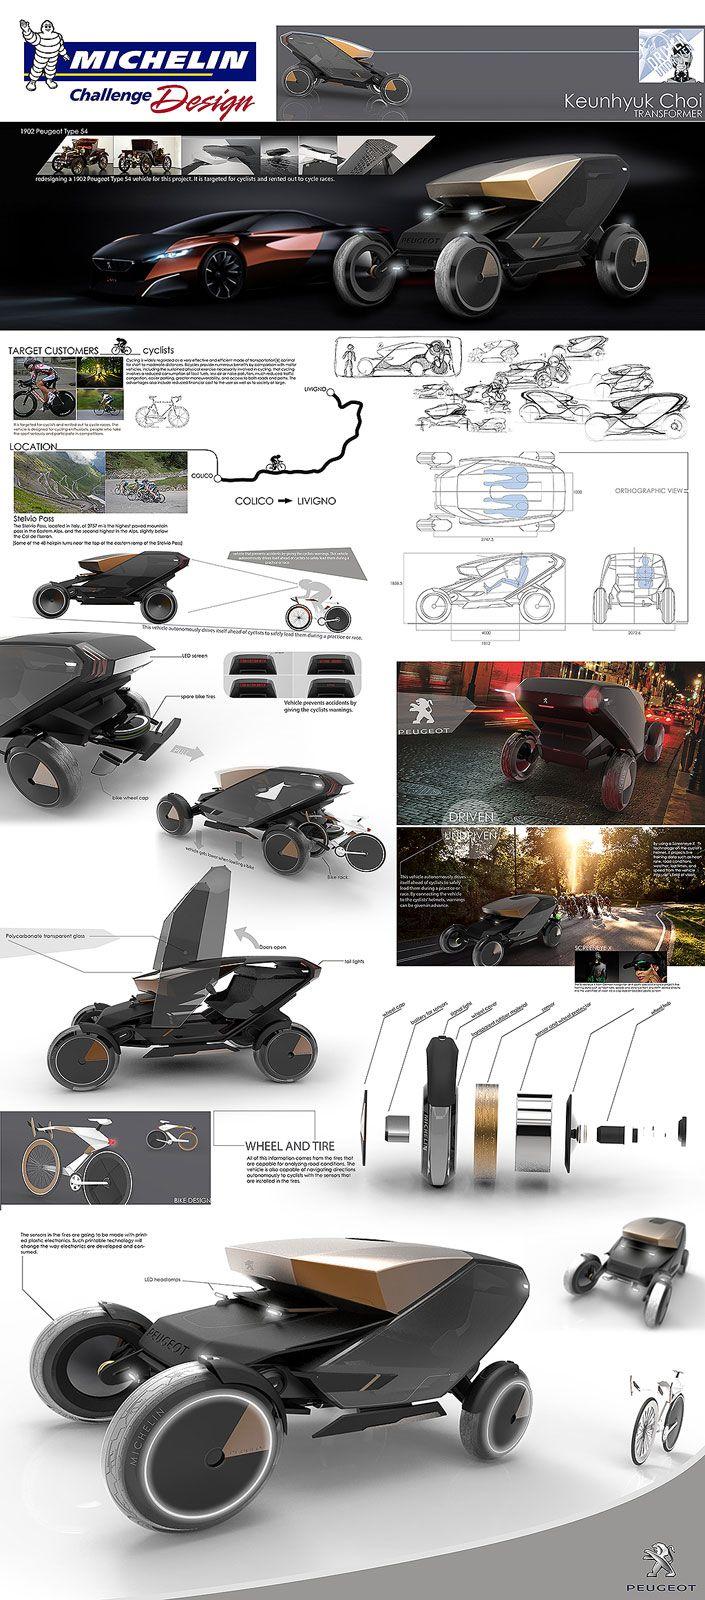 Transformer Concept by Keunhyuk Choi - Design Panel